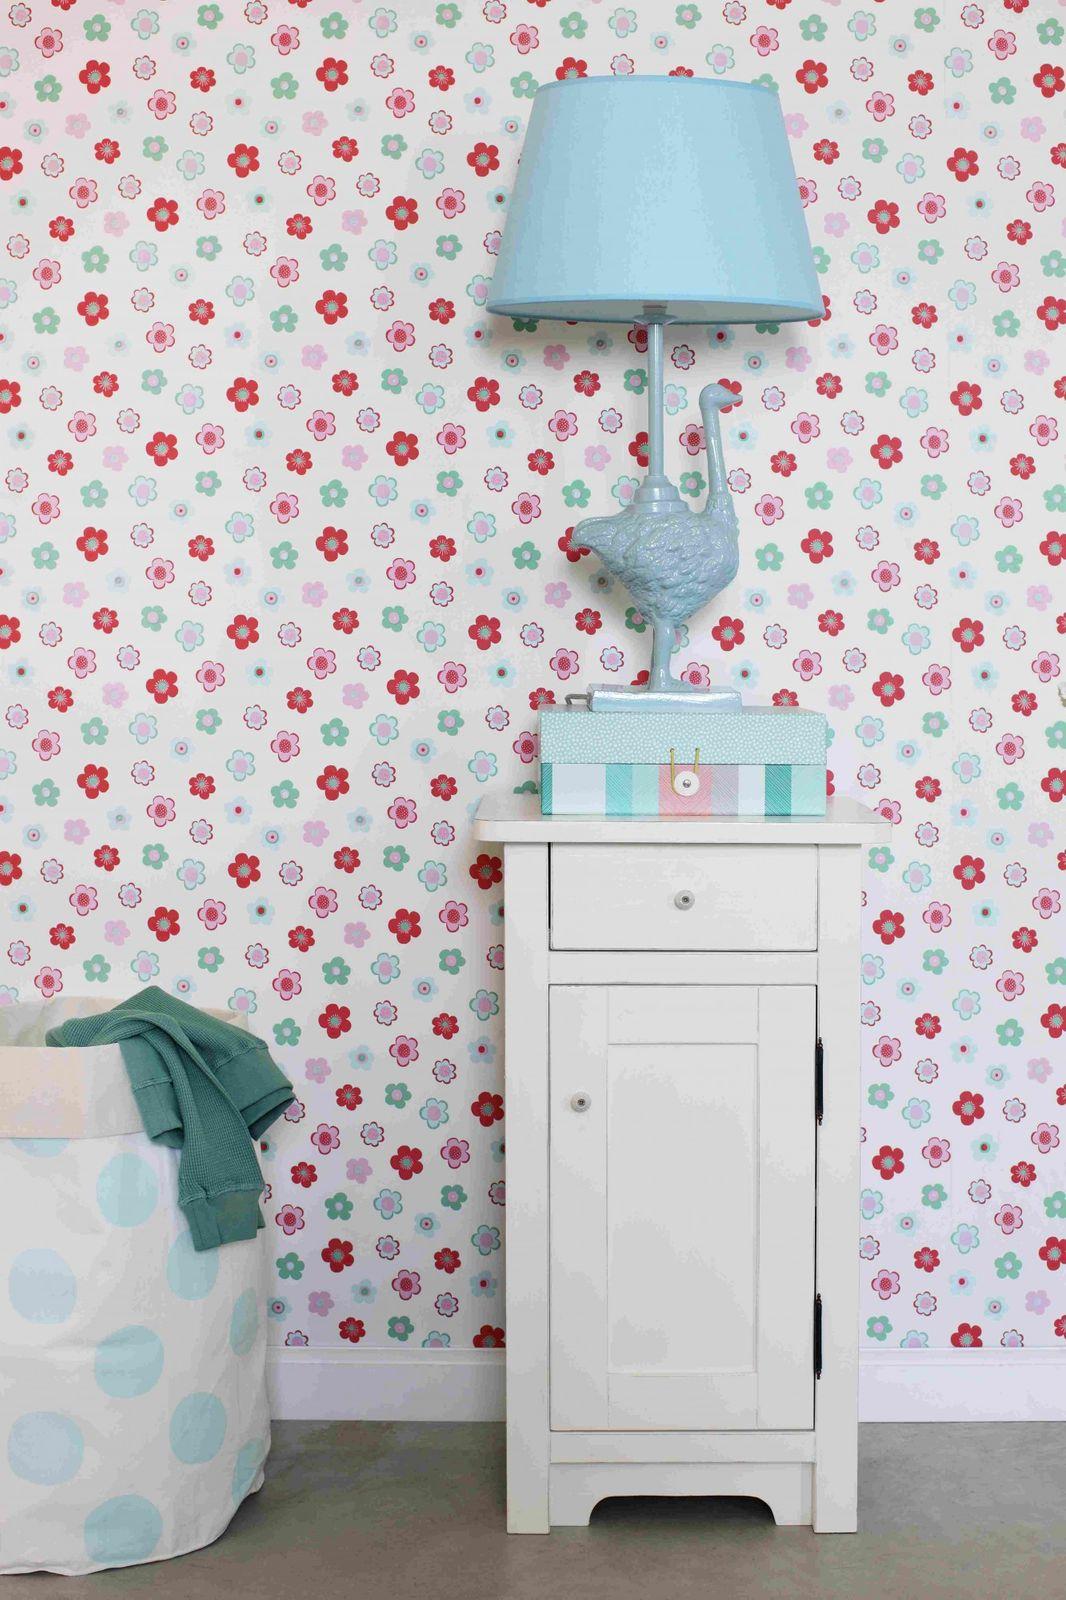 tapete vlies blumen rosa gr n rot everybody bonjour 138726. Black Bedroom Furniture Sets. Home Design Ideas